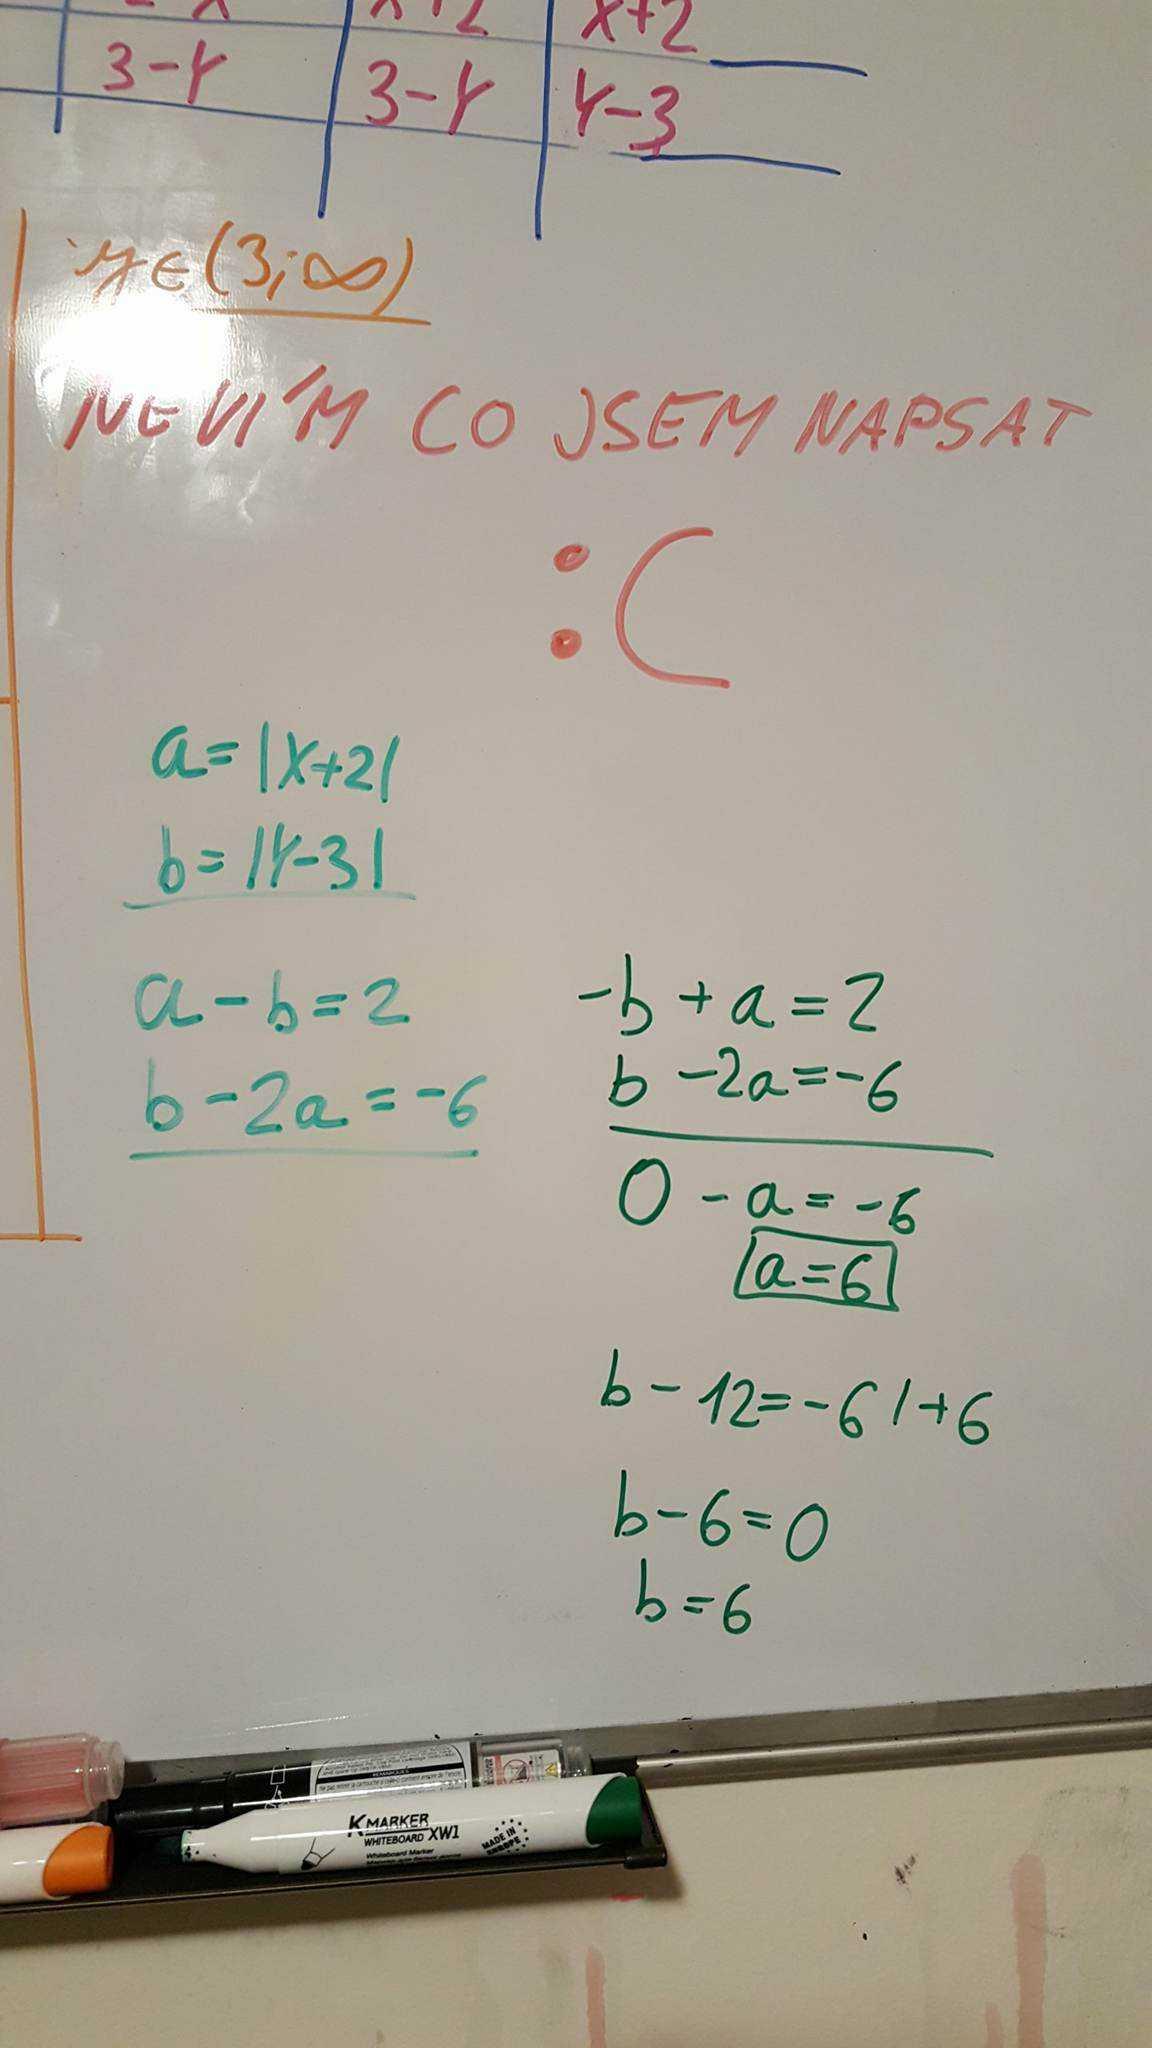 http://forum.matematika.cz/upload3/img/2018-02/63359_tabule.jpg